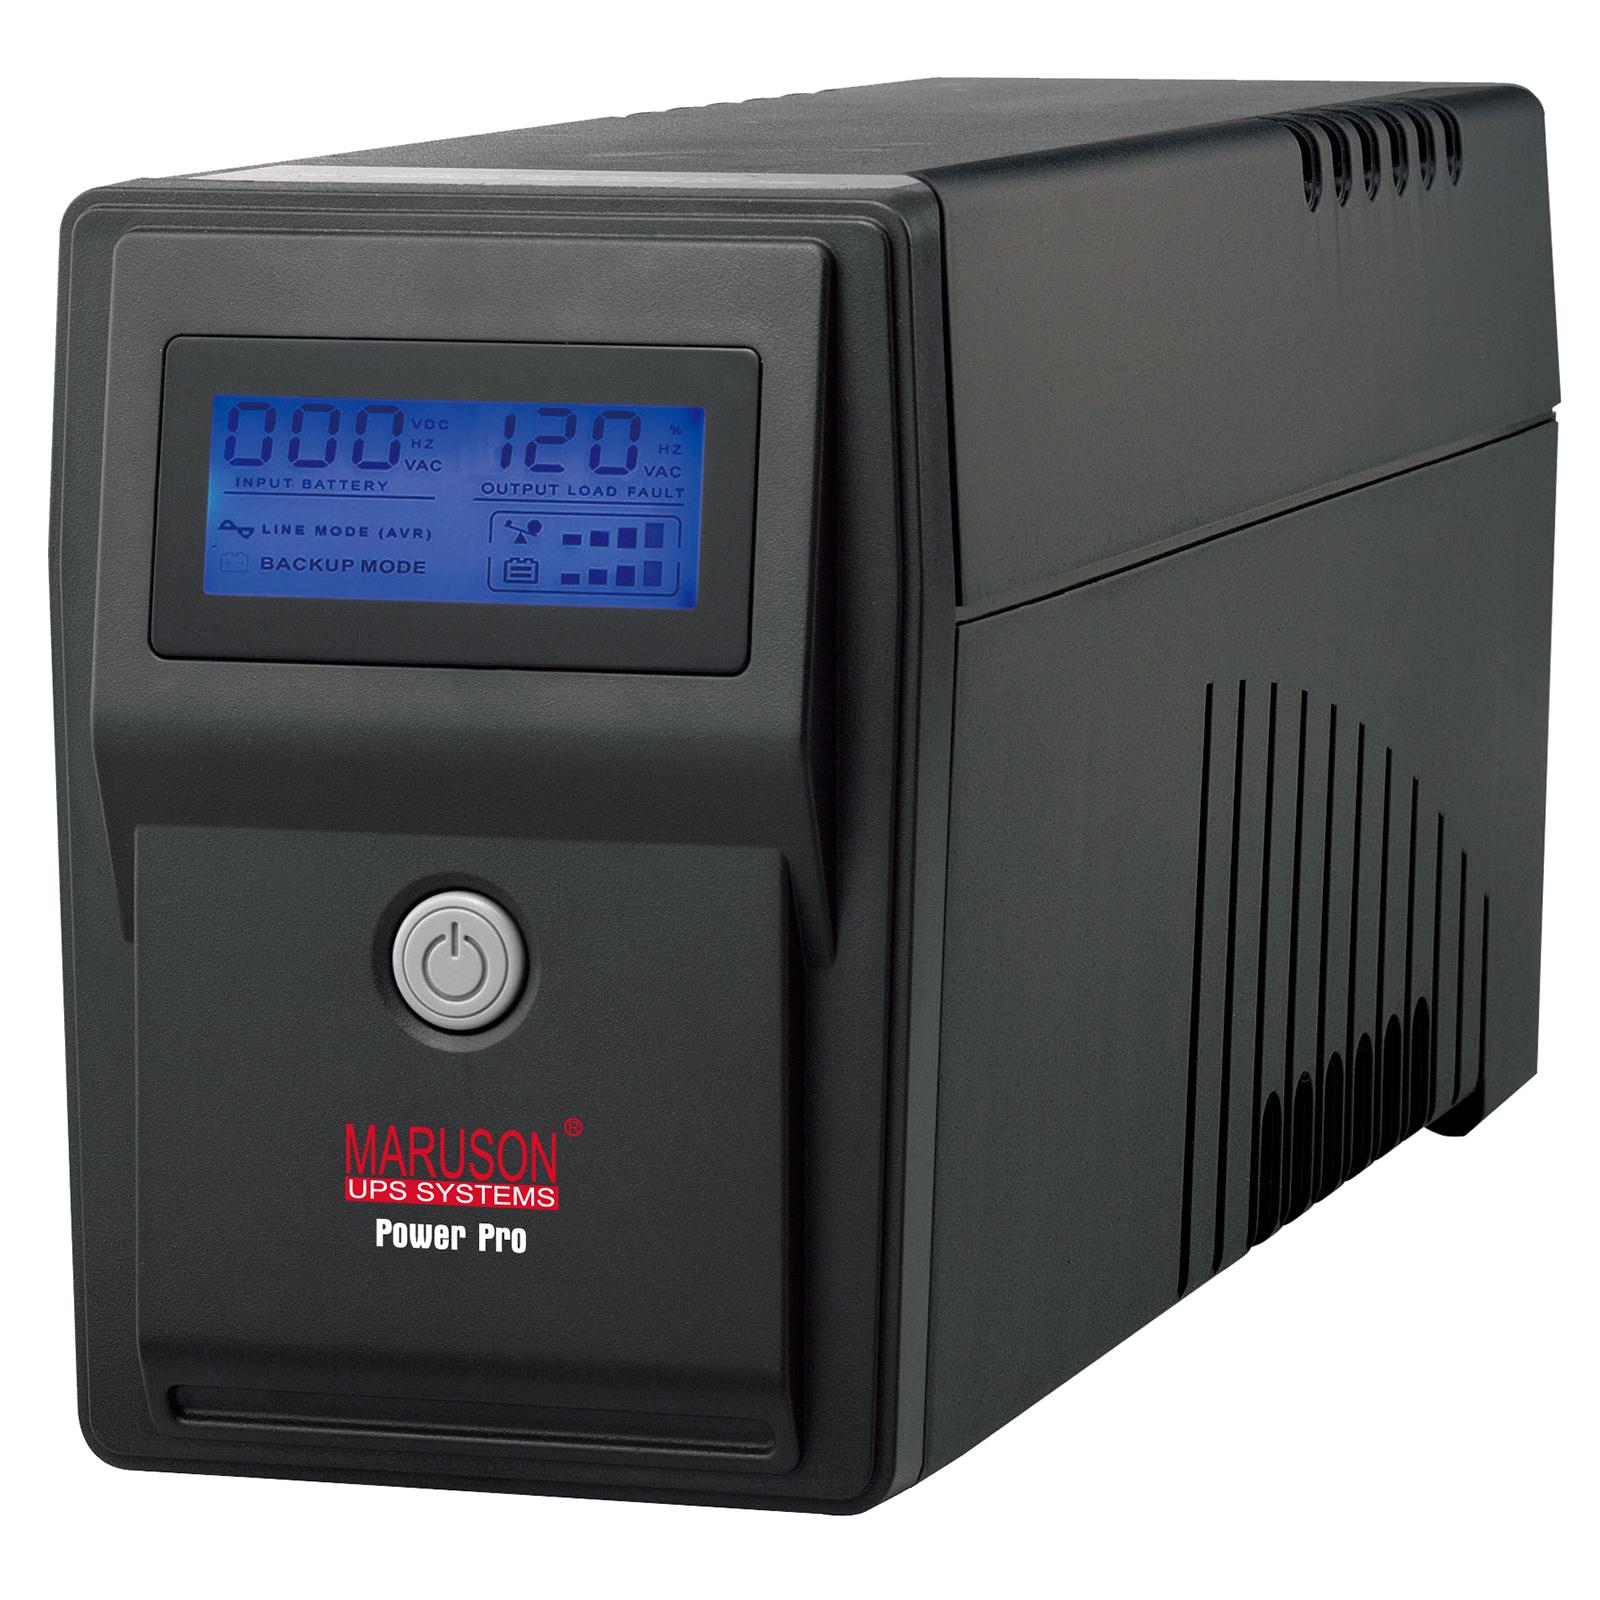 MARUSON POWERPRO ALCD SERIES 1500 VA - UPS SYSTEMS - PRO-1500ALCD